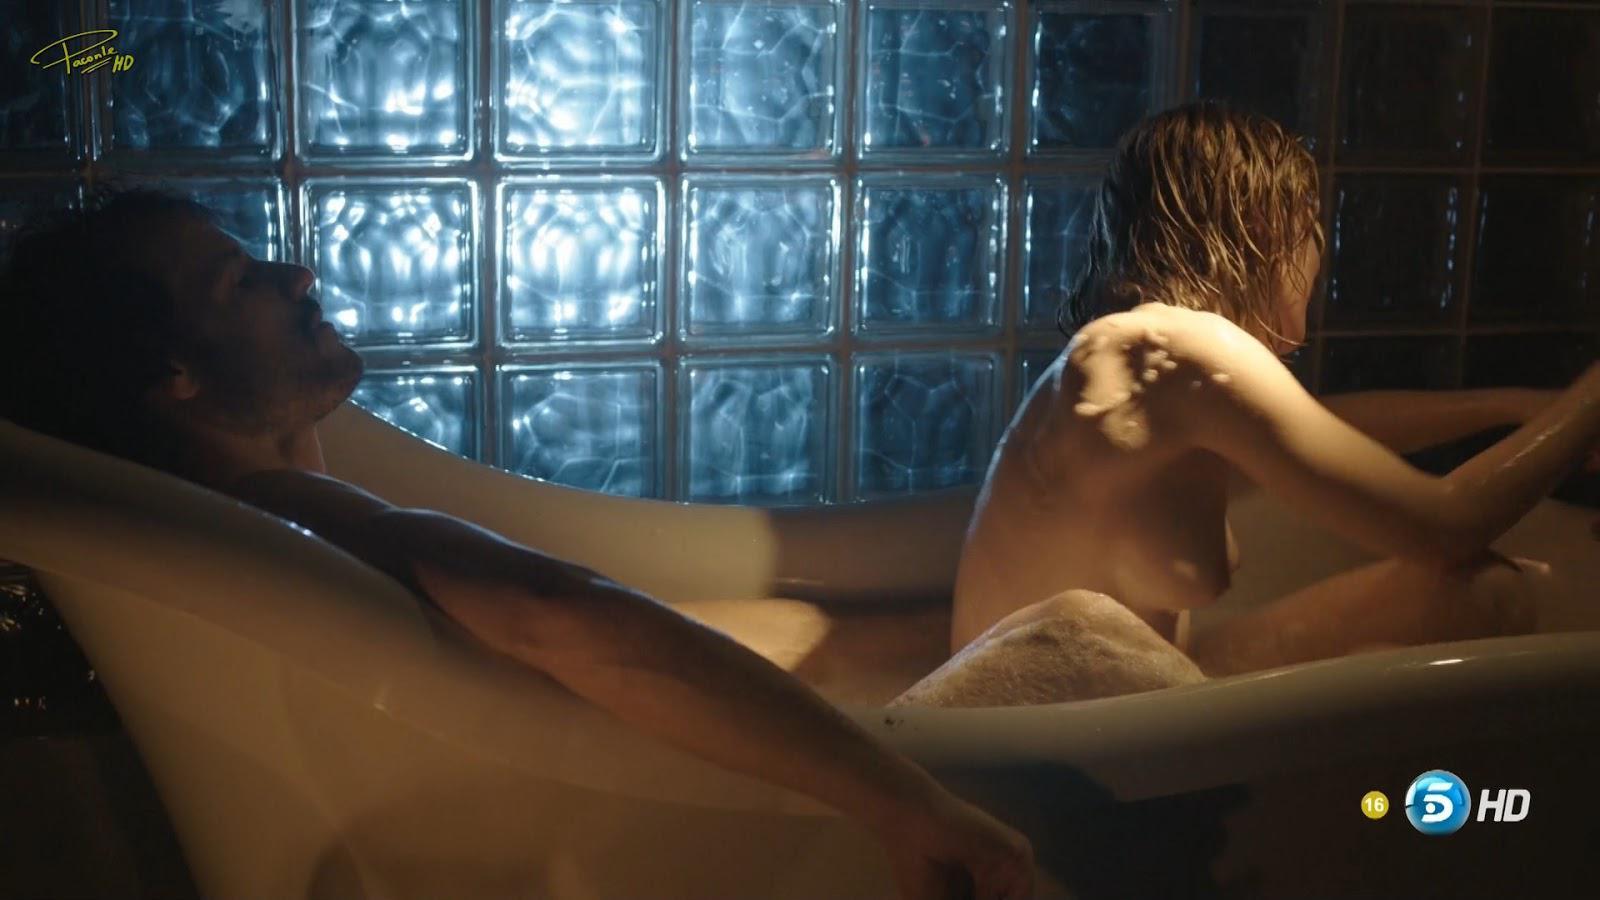 Maria Valverde desnuda follando